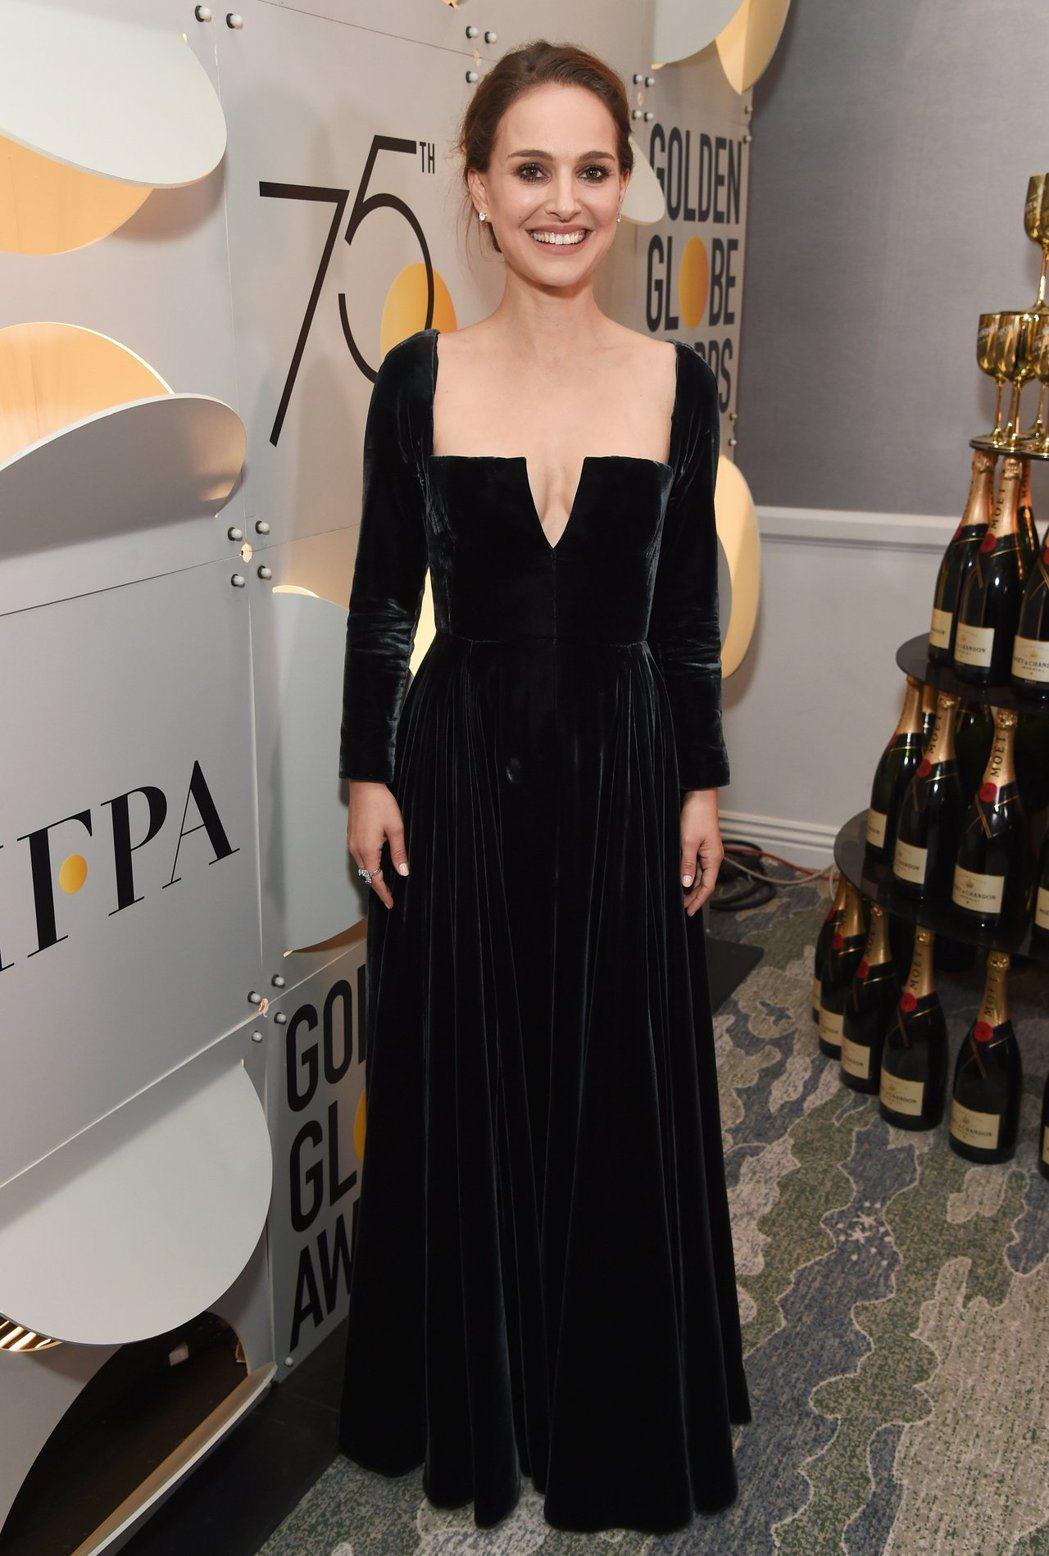 娜塔莉波曼以Tiffany單鑽耳環和藍寶石鑽戒襯托Dior禮服。圖/Dior提供